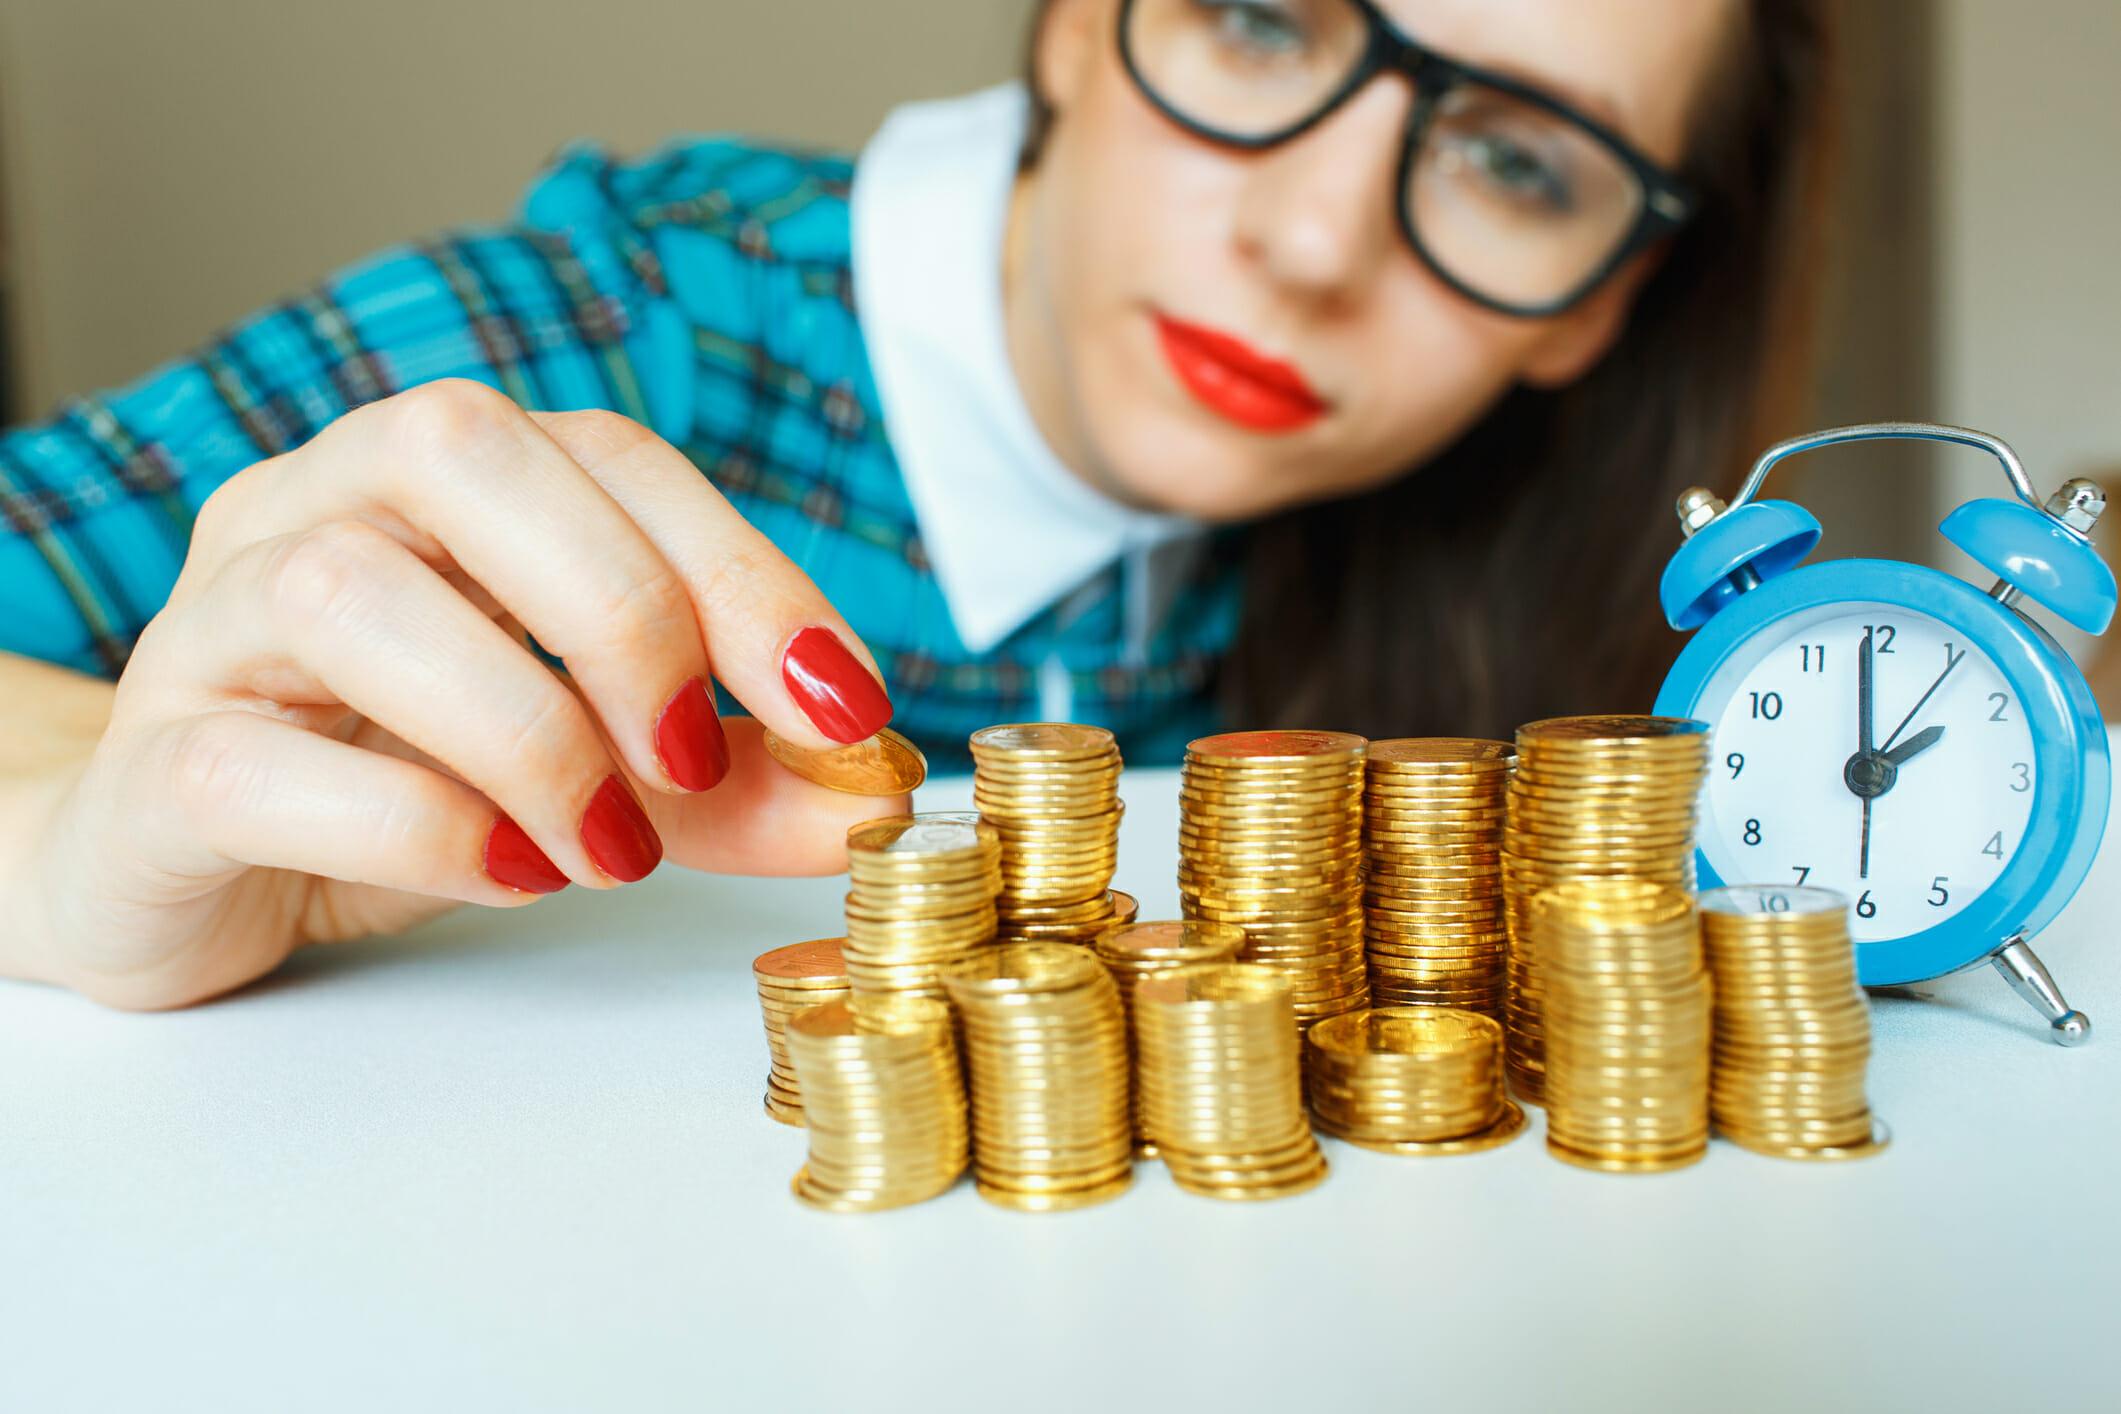 Simple money steps for women